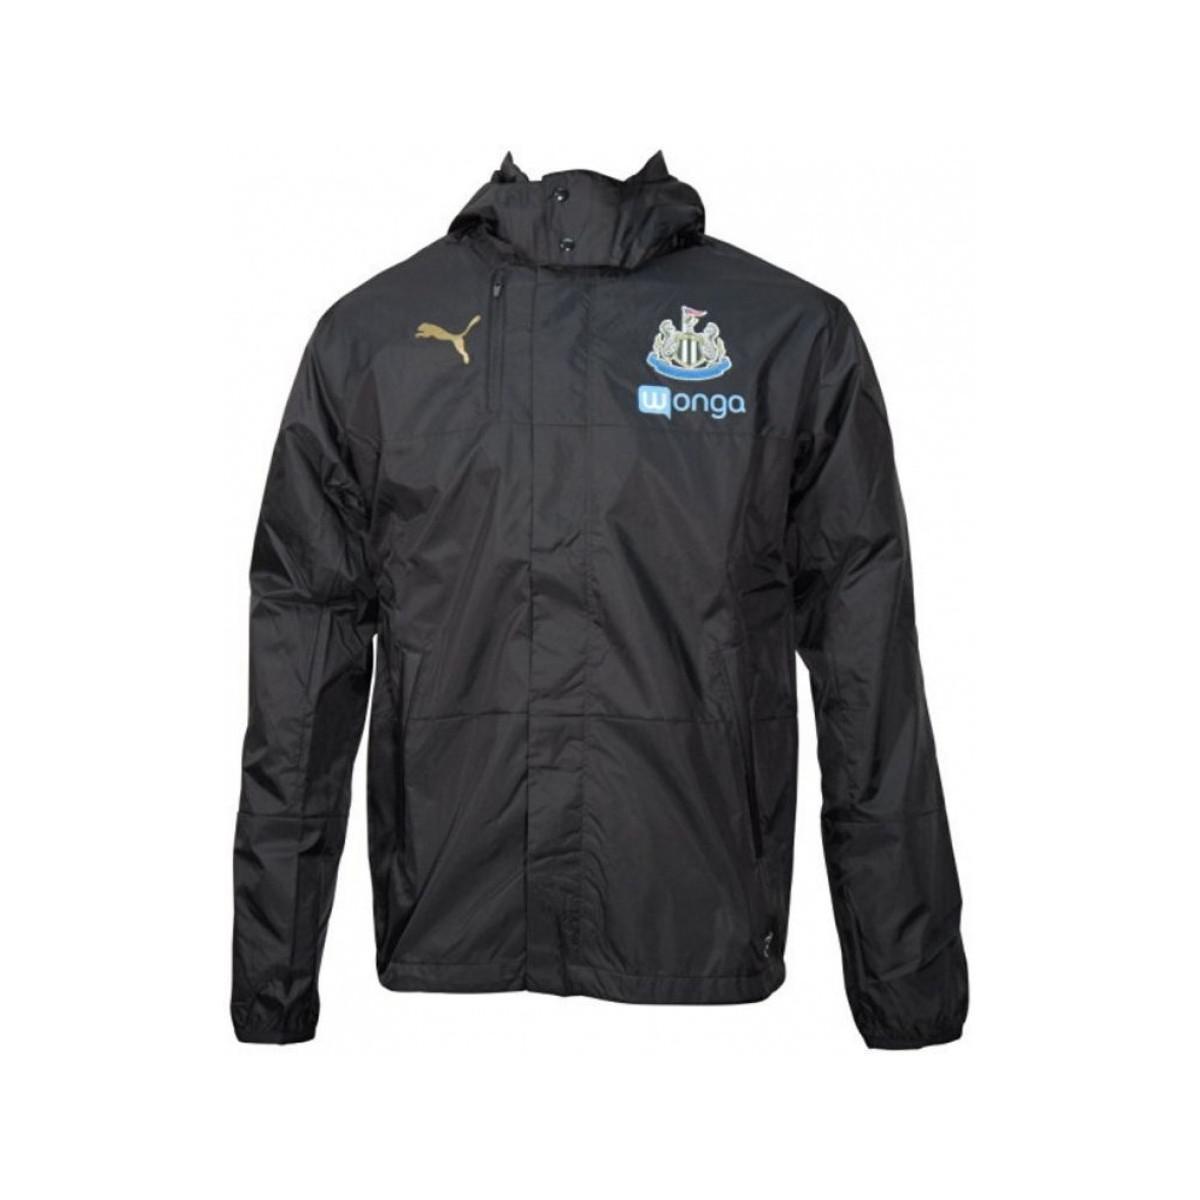 d199c39c670d Puma 2016-2017 Newcastle Lightweight Rain Jacket Men s In Black in ...